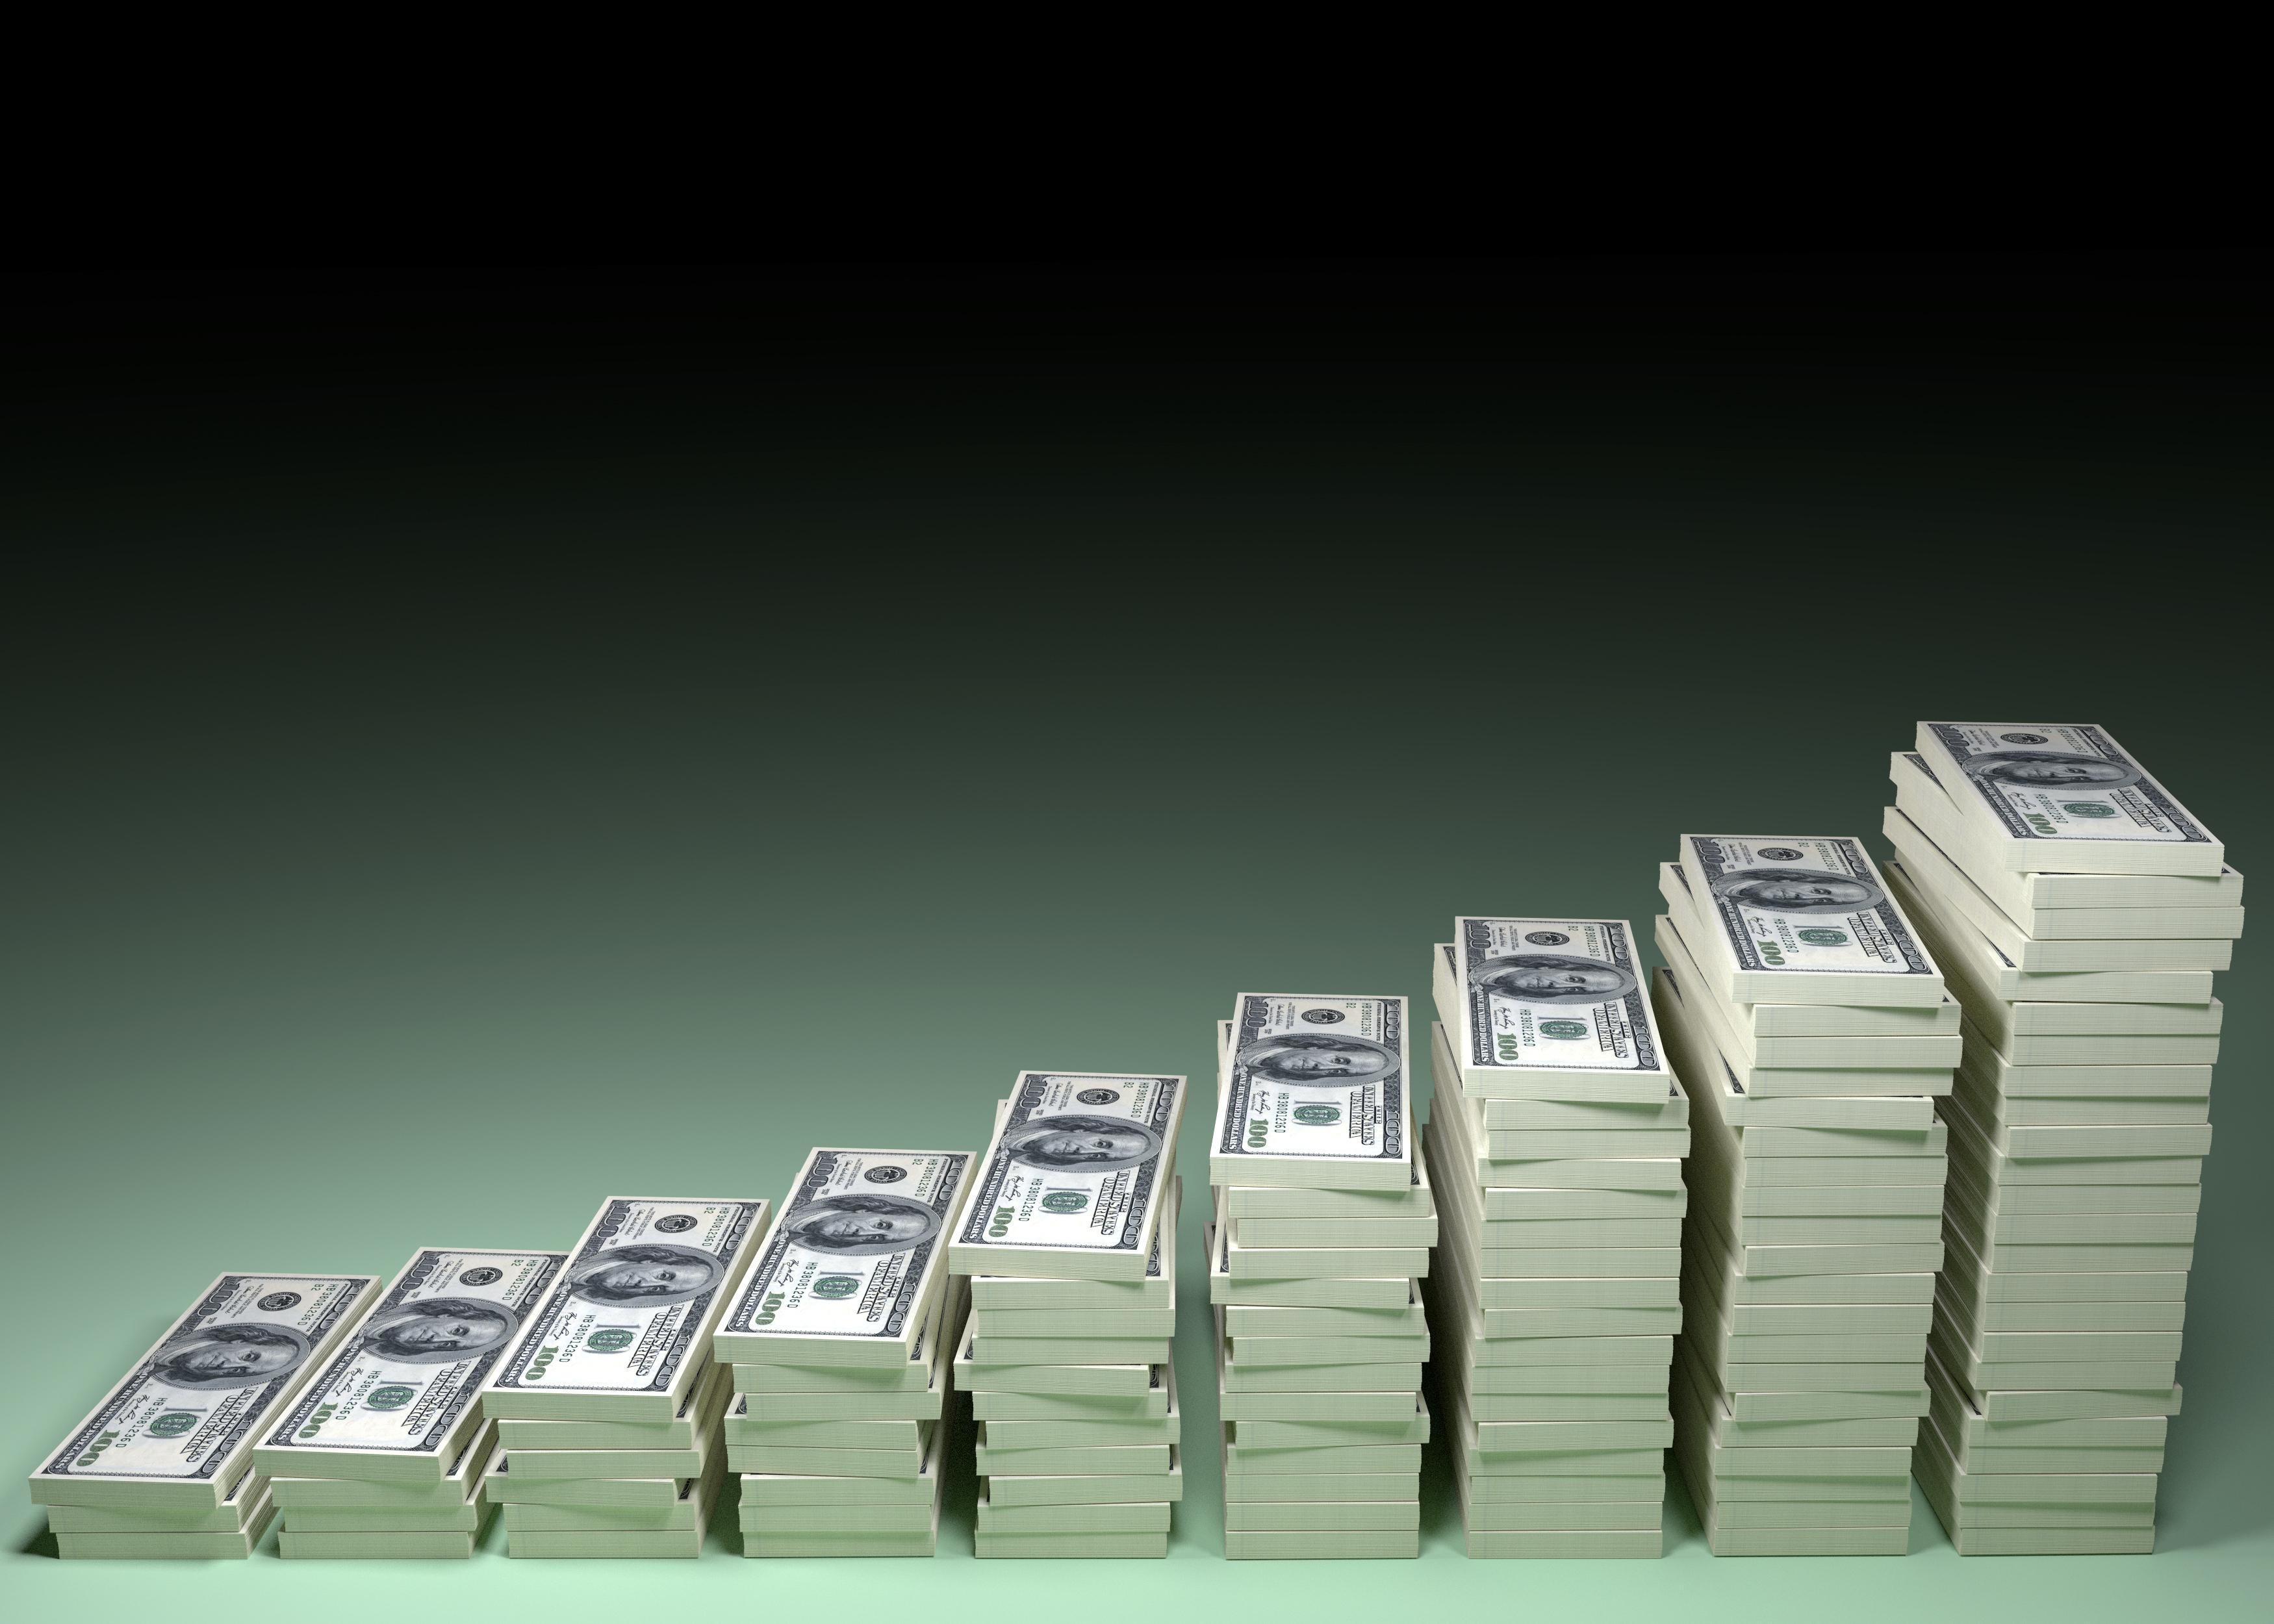 Money stacks arranged from shortest to tallest.